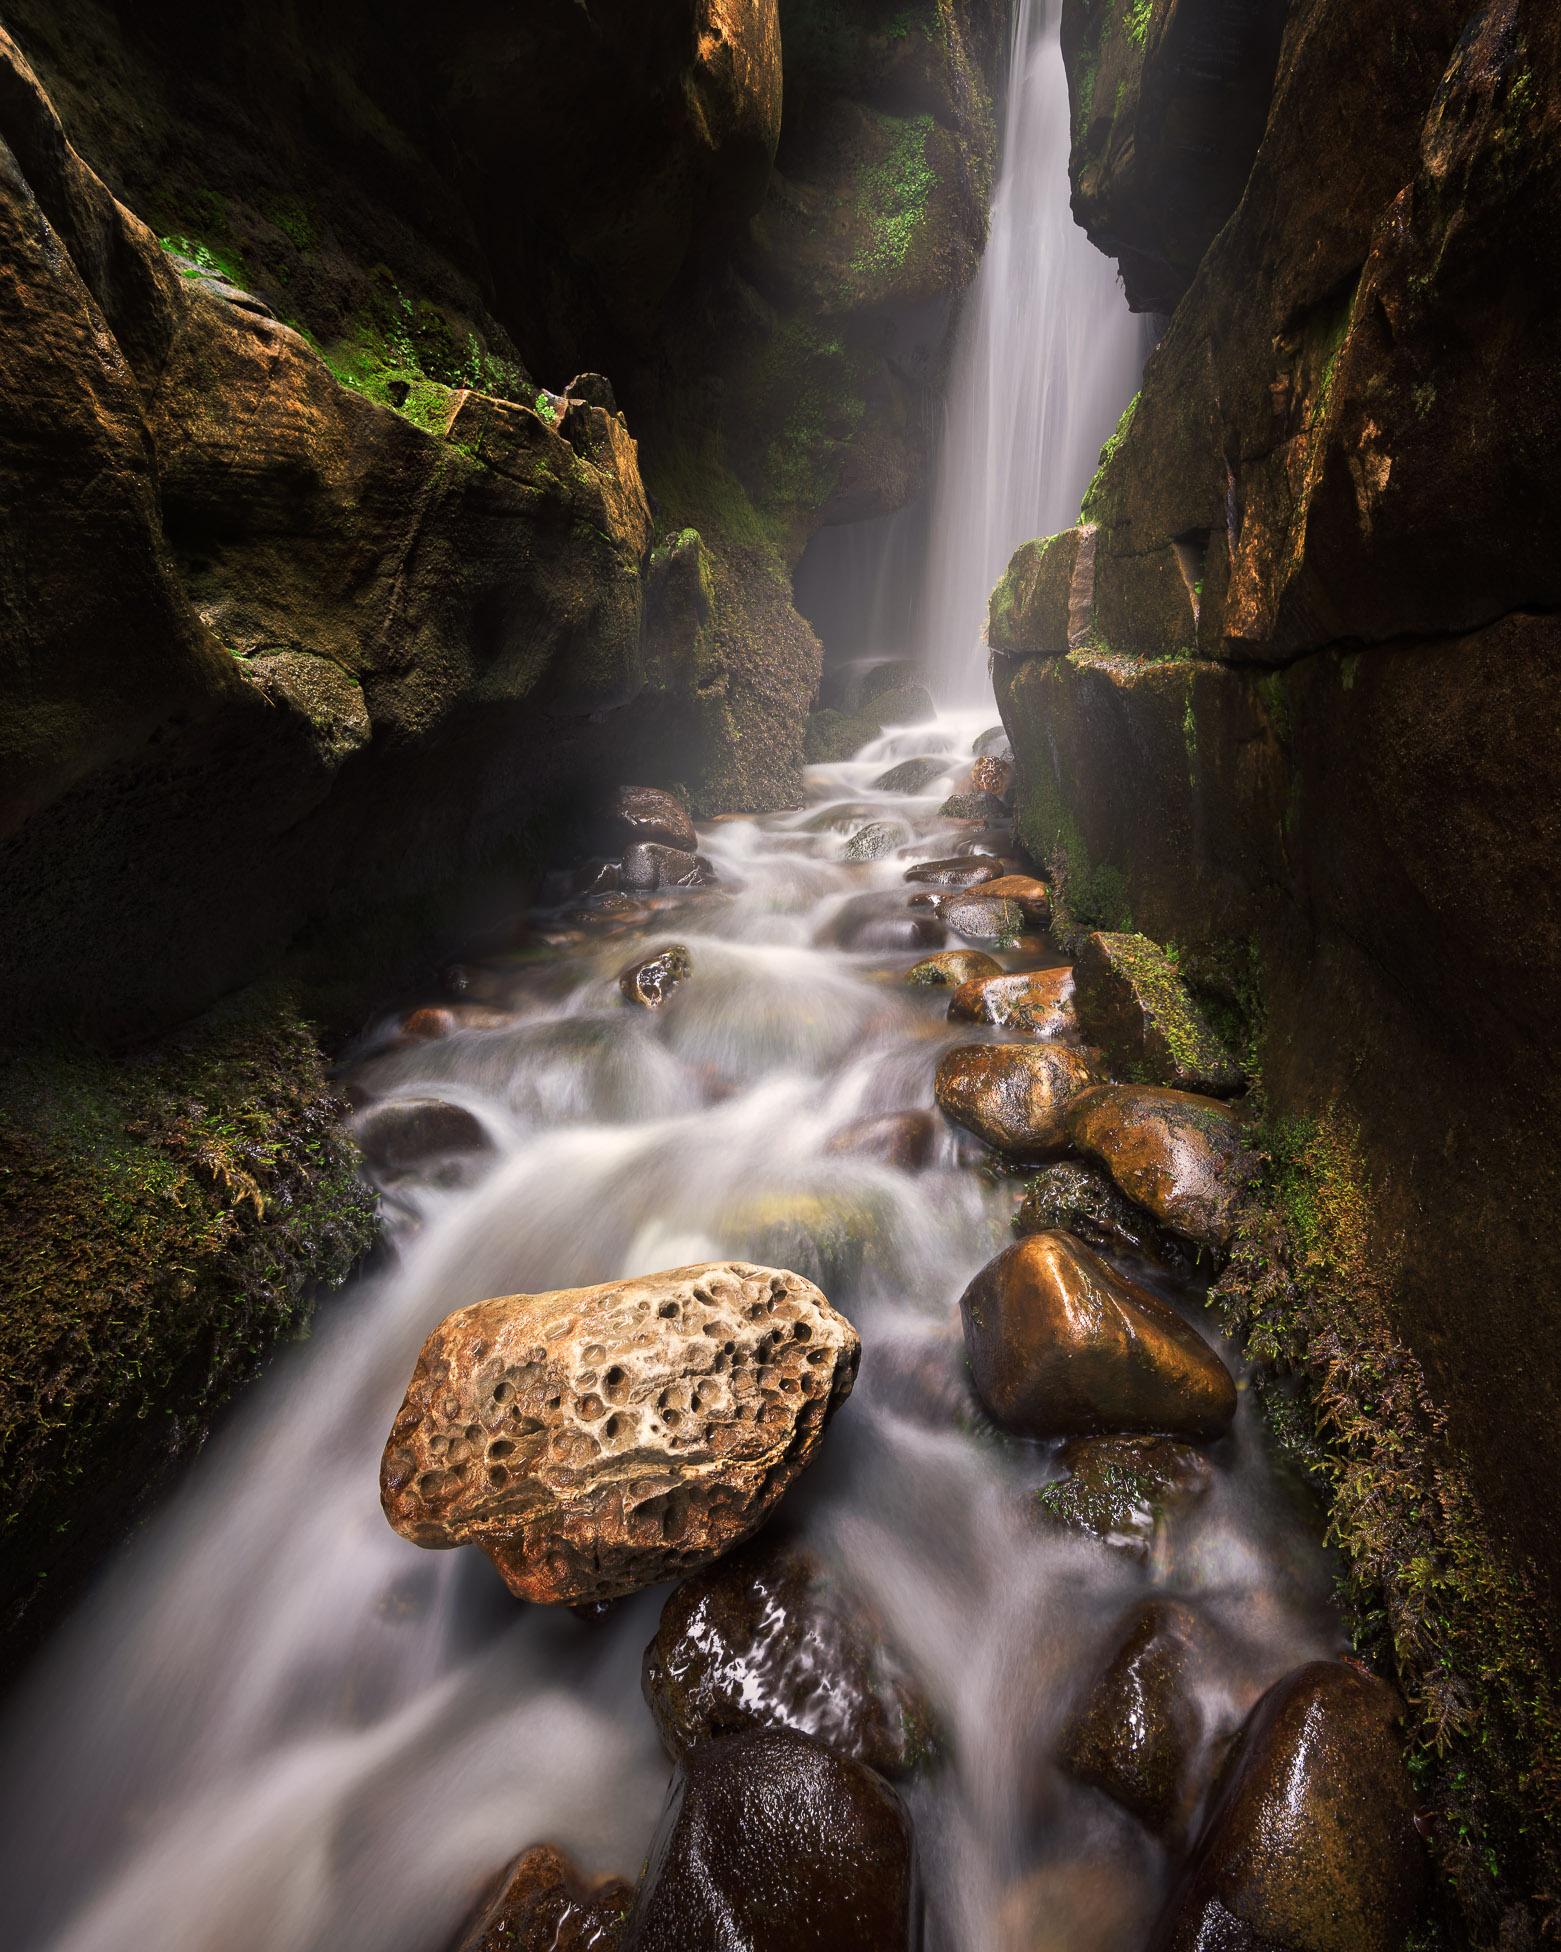 Small Waterfall, Isle of Eigg, Scotland, United Kingdom